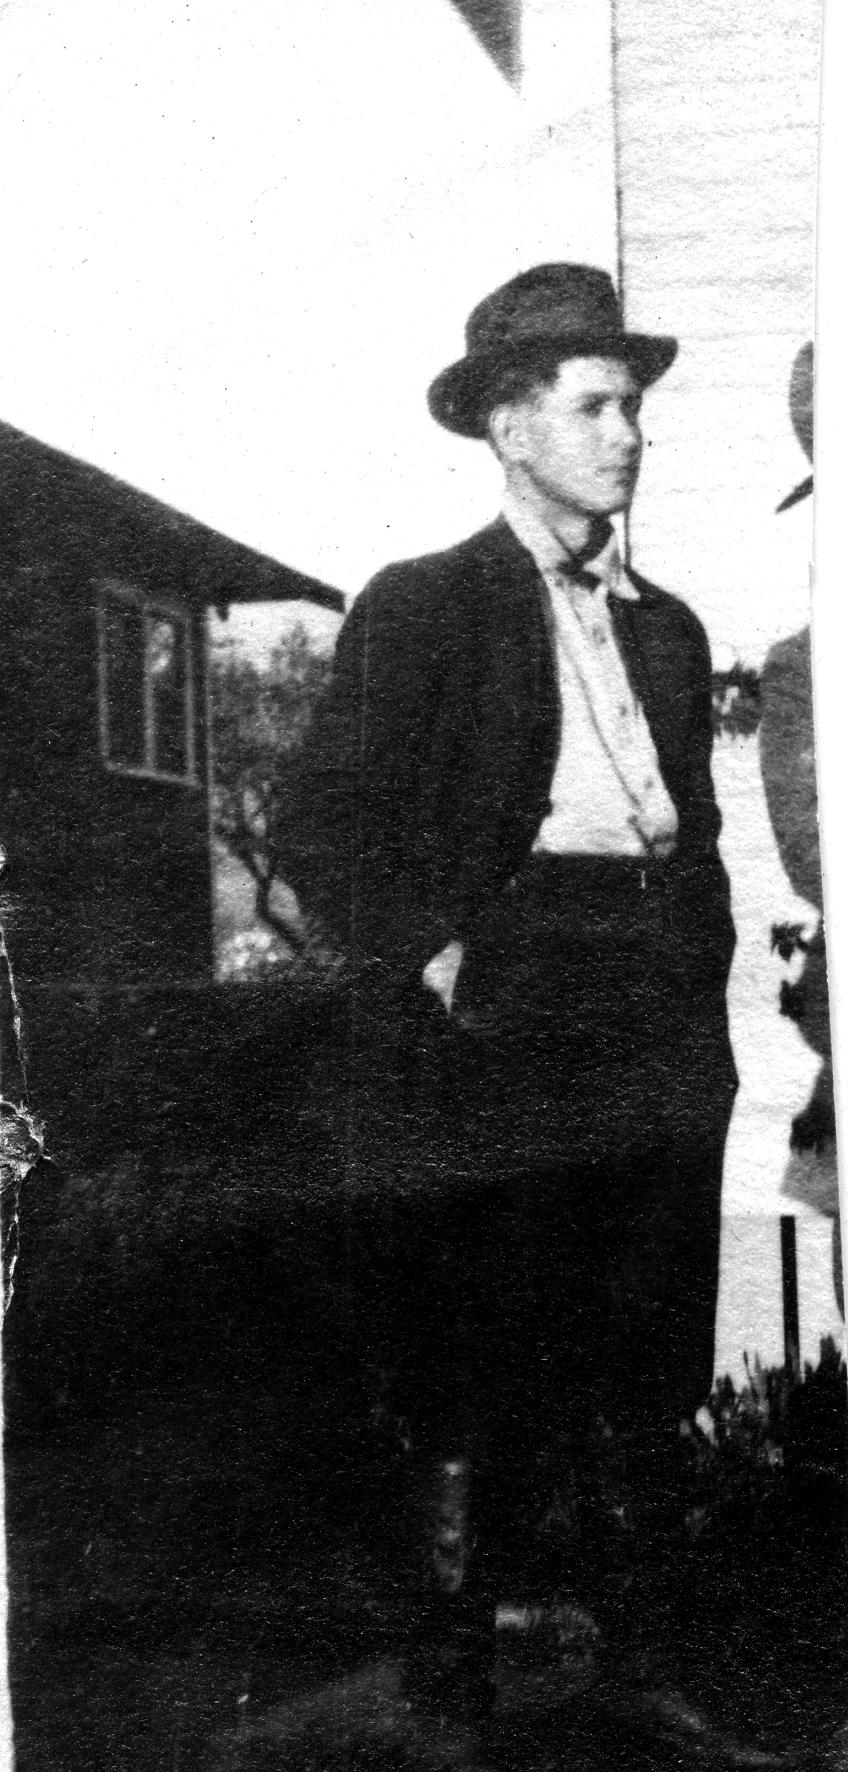 Jose Diaz, father of Richard Hernando Diaz Higgins (1914-1988)